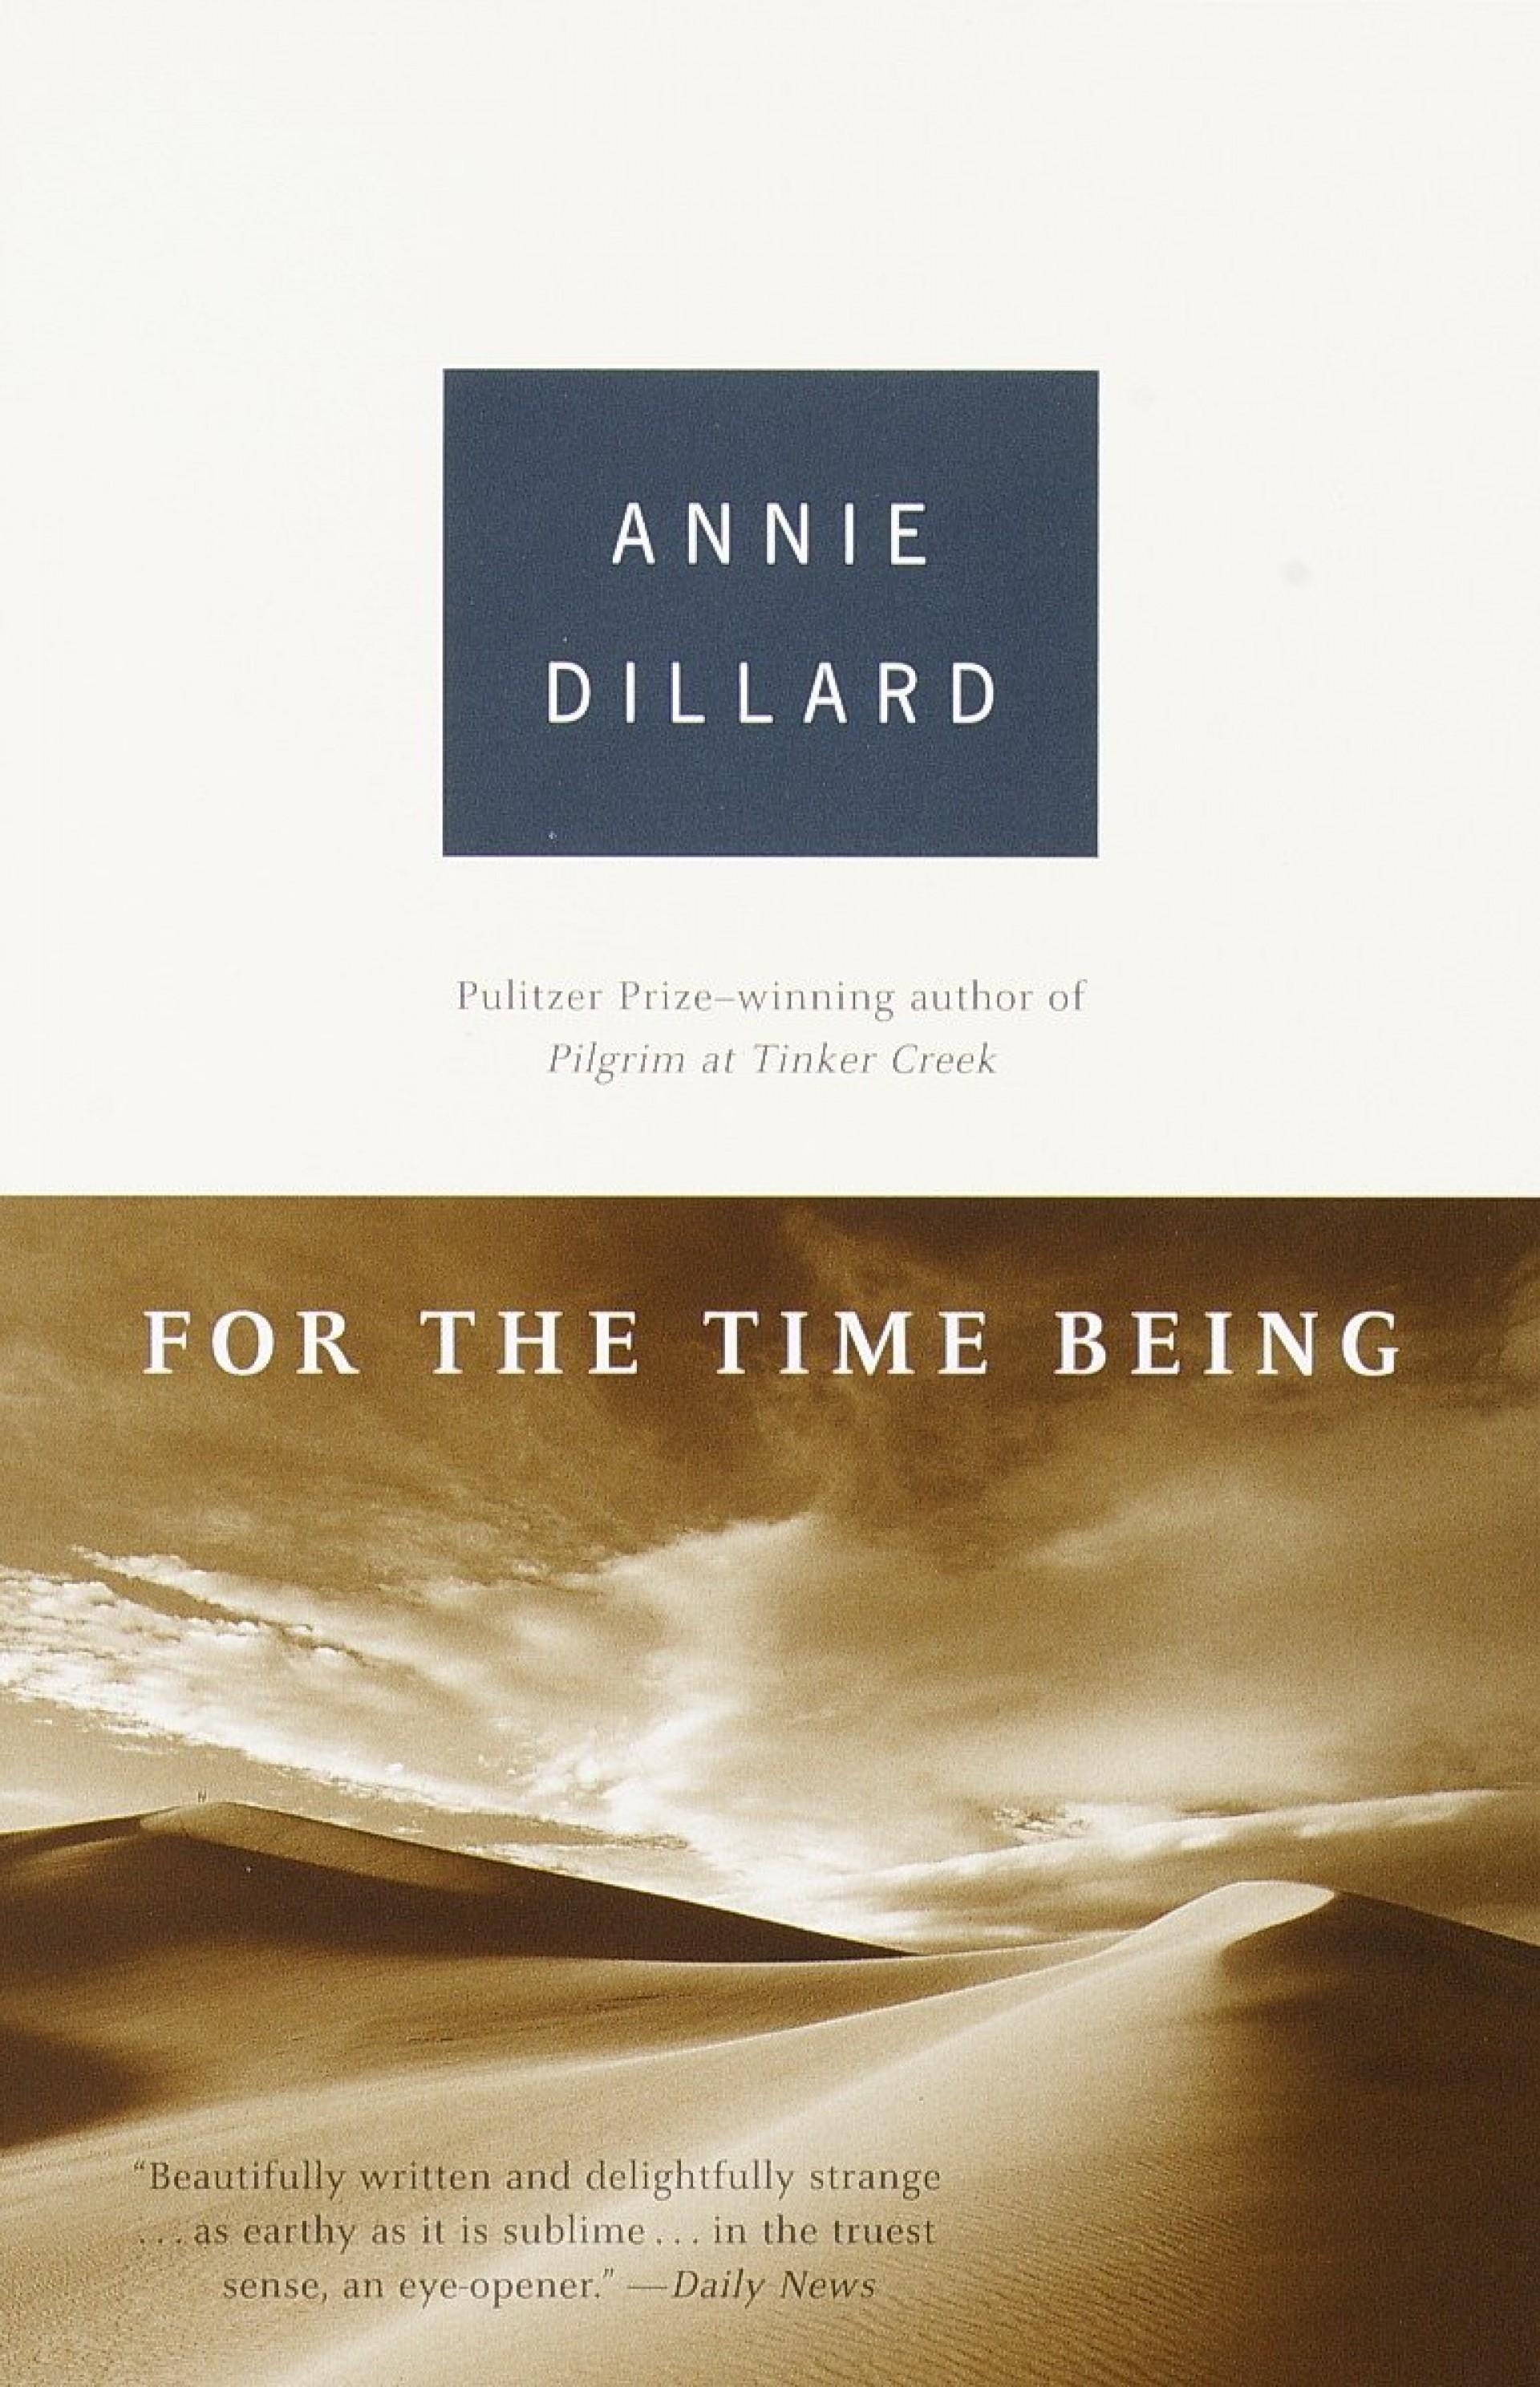 013 Annie Dillard Essays Essay Example Stirring Stunt Pilot Pdf An American Childhood 1920